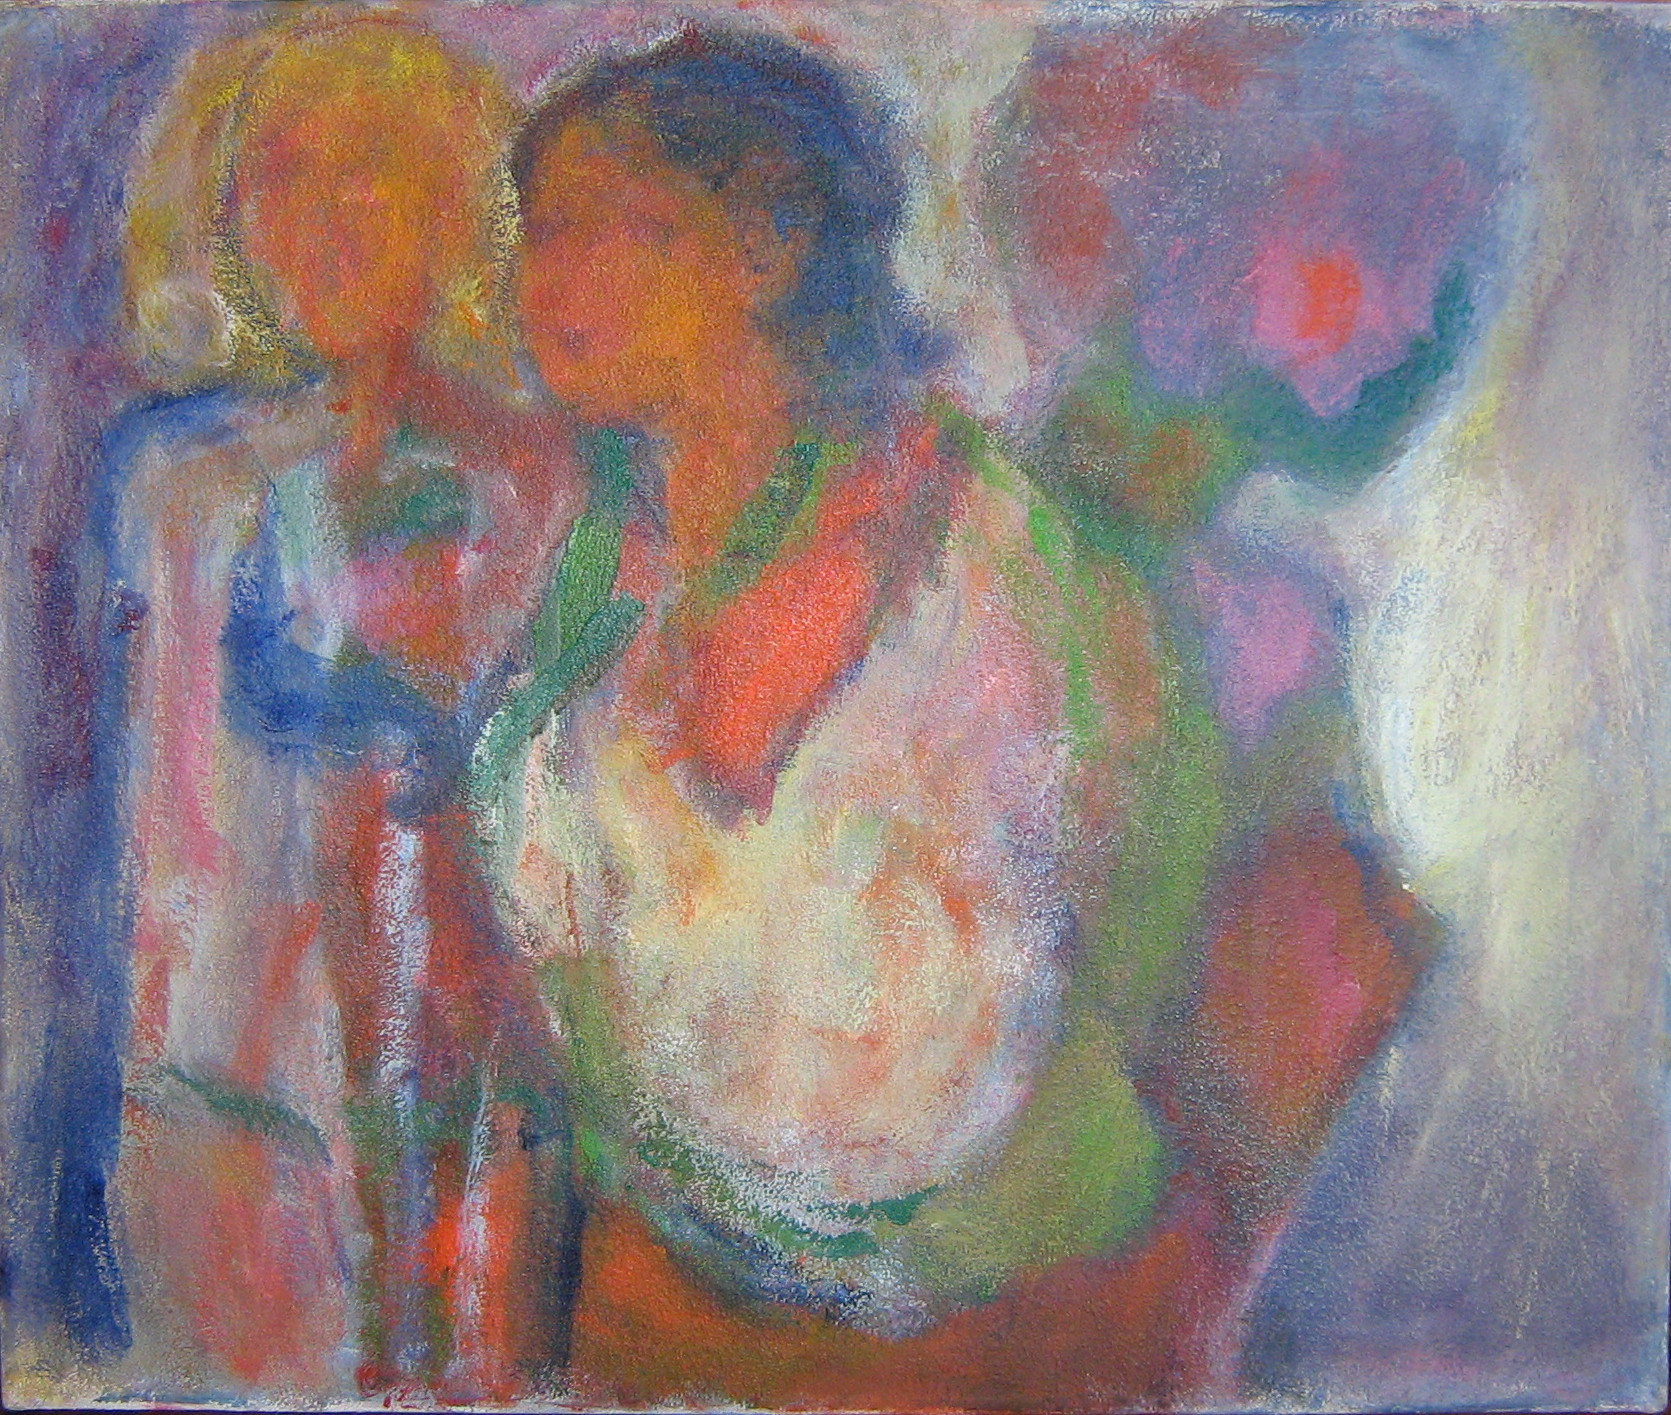 Mujeres 2007 acr lico sobre lienzo 50 x 60 cm - Acrilico sobre lienzo ...